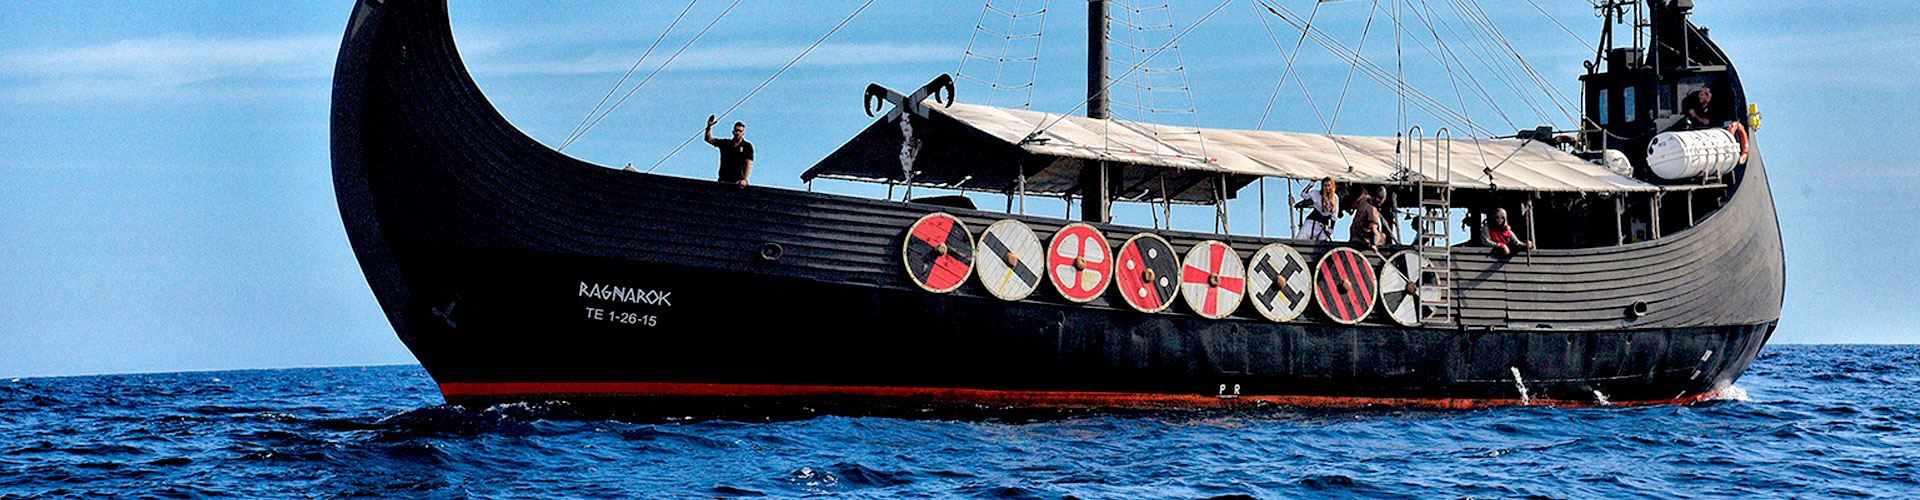 Crucero Vikingo – Ragnarock